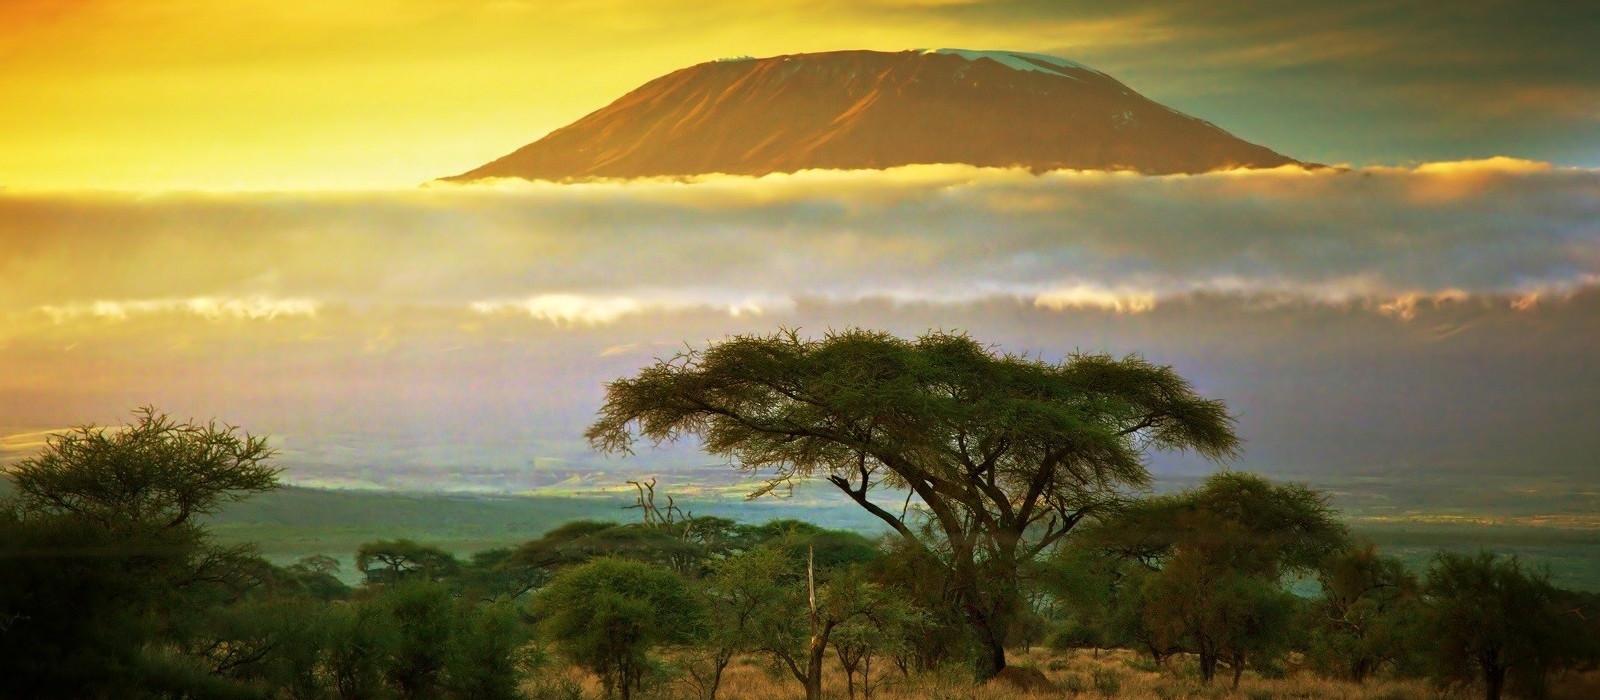 Tansania Luxusreise: Serengeti, Viktoriasee & Ngorongoro Krater Urlaub 1